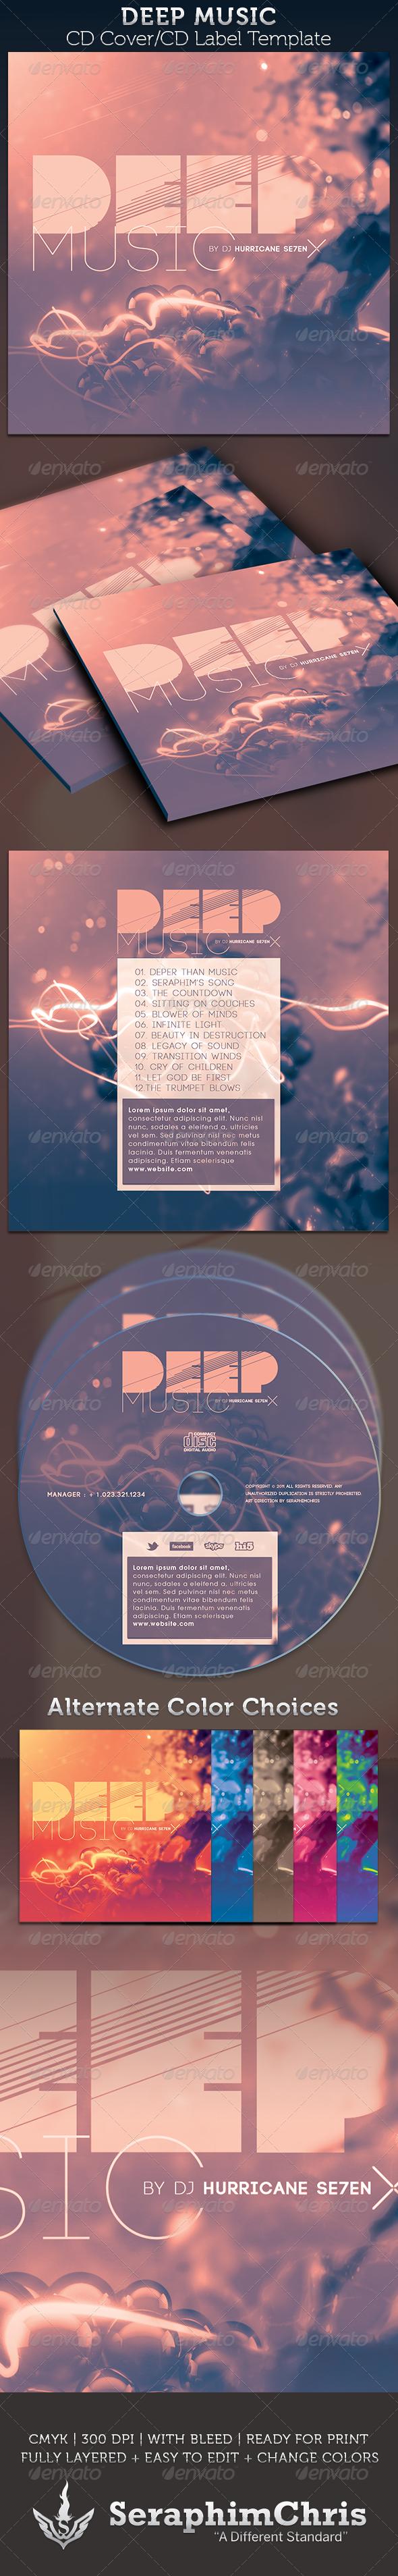 GraphicRiver Deep Music CD Cover Artwork Template 3046872